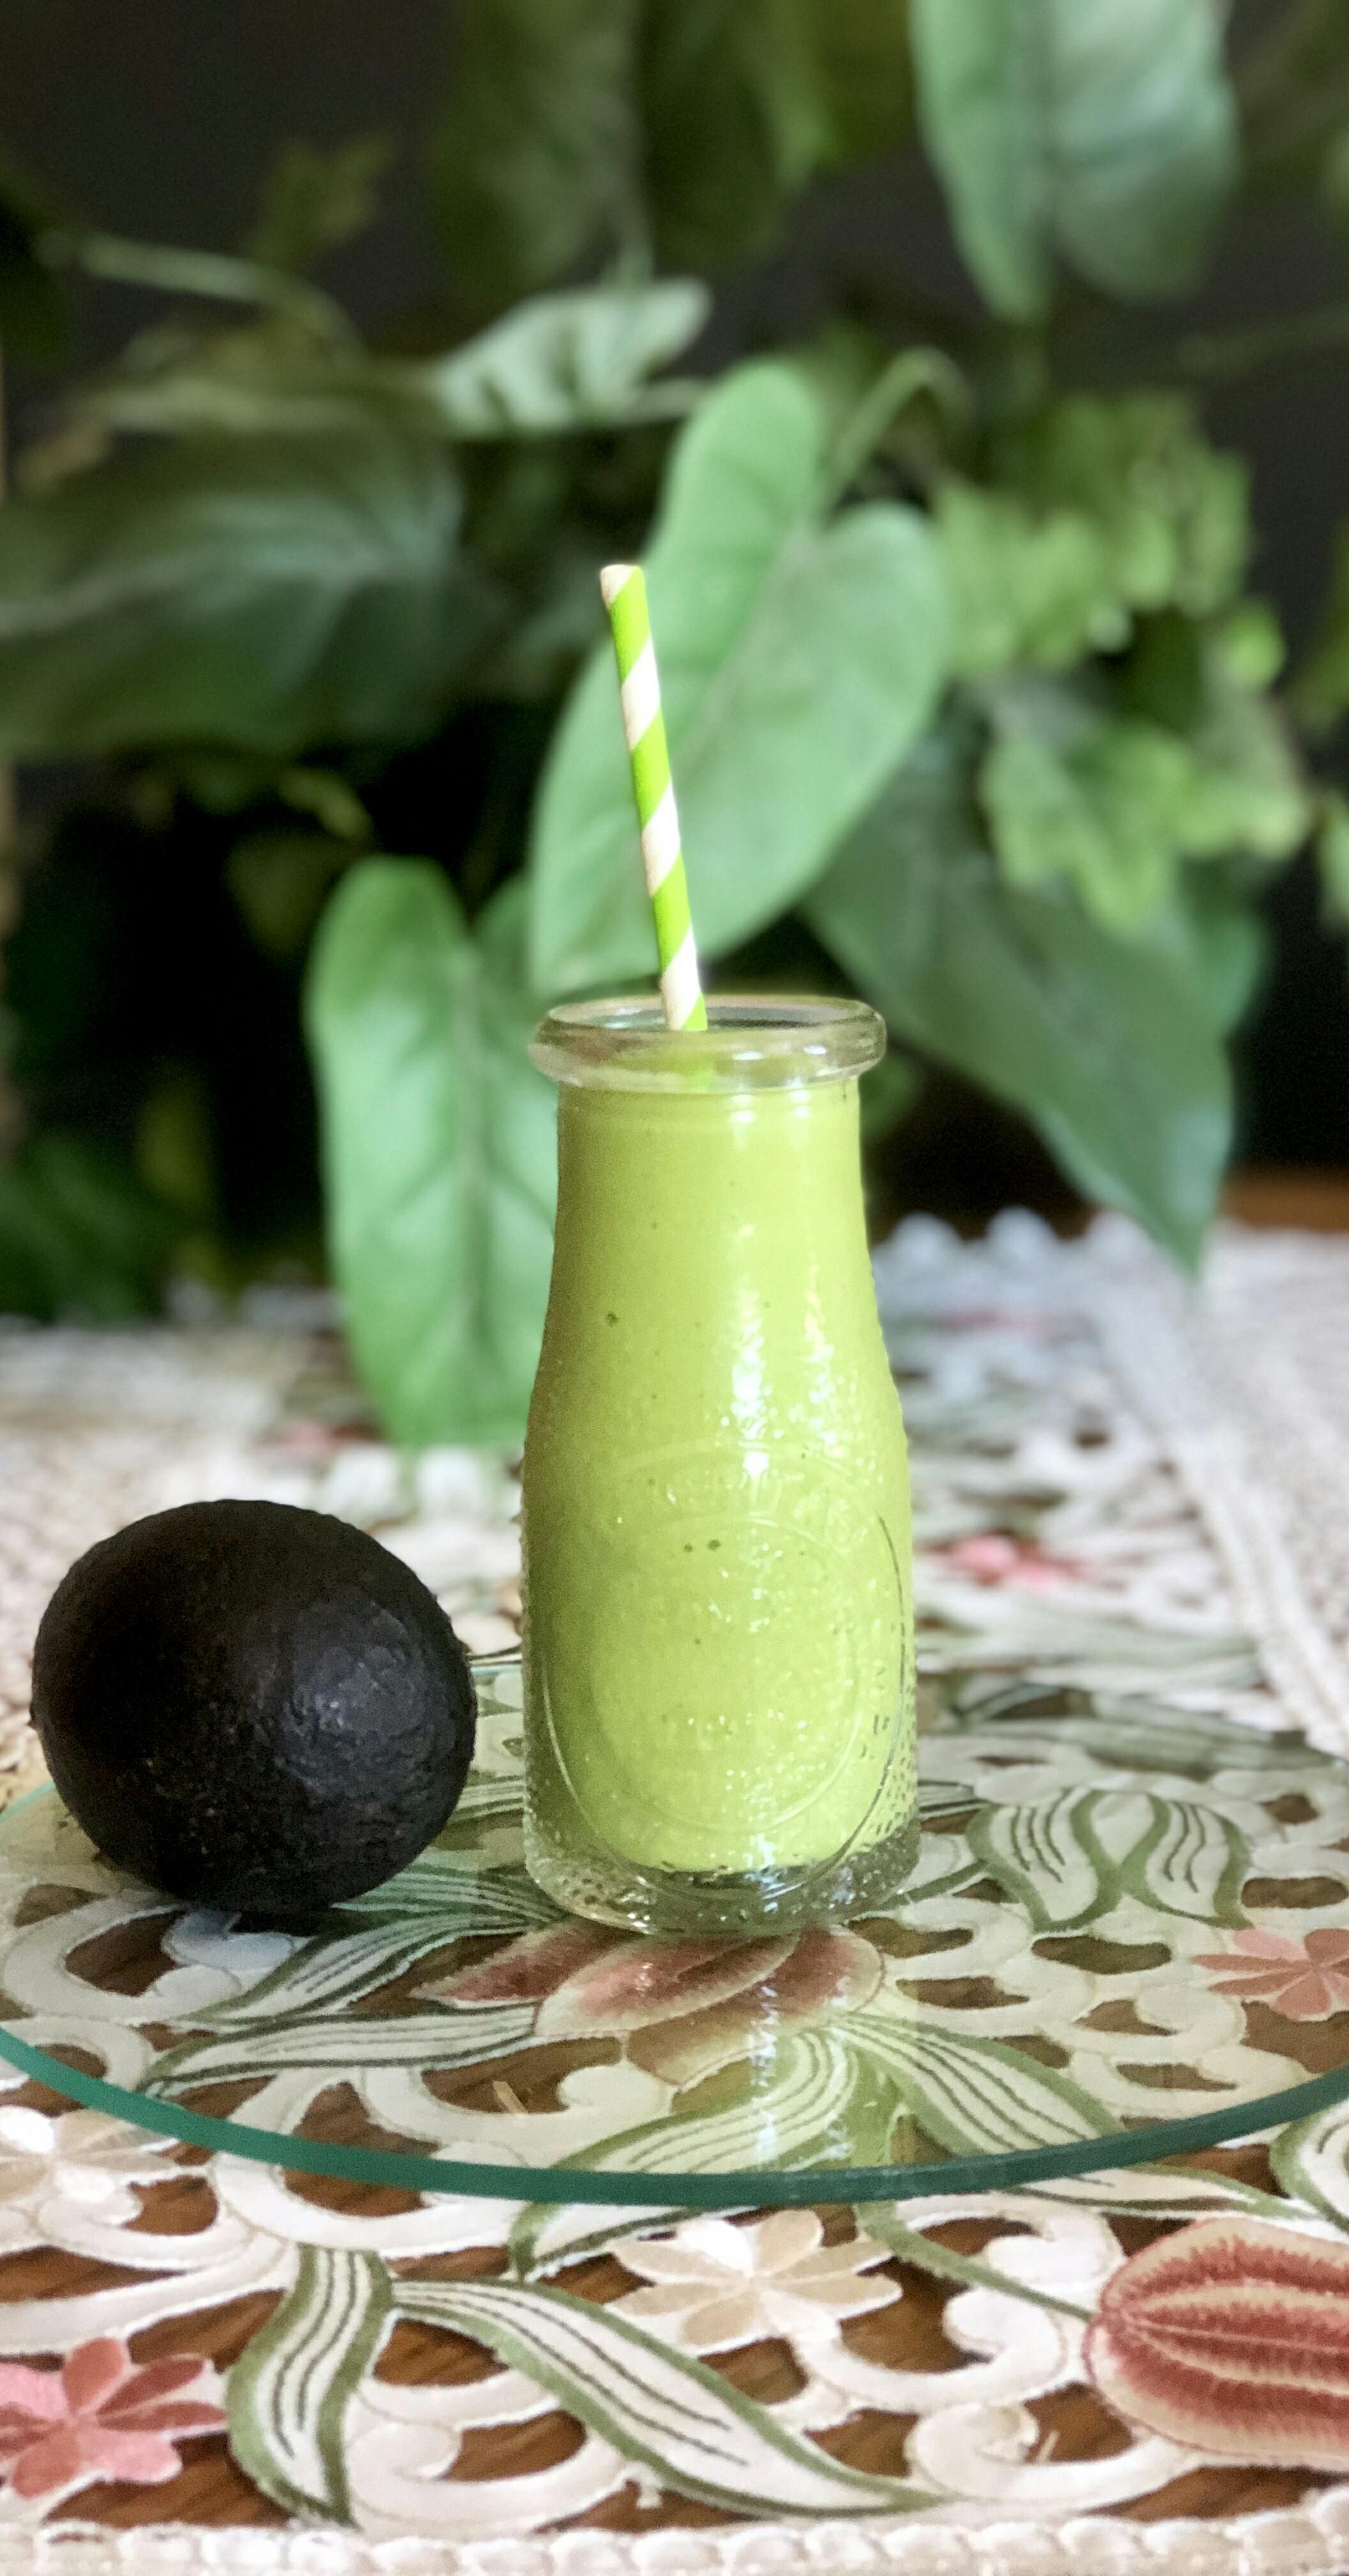 Keto Avocado-Spinach Smoothie